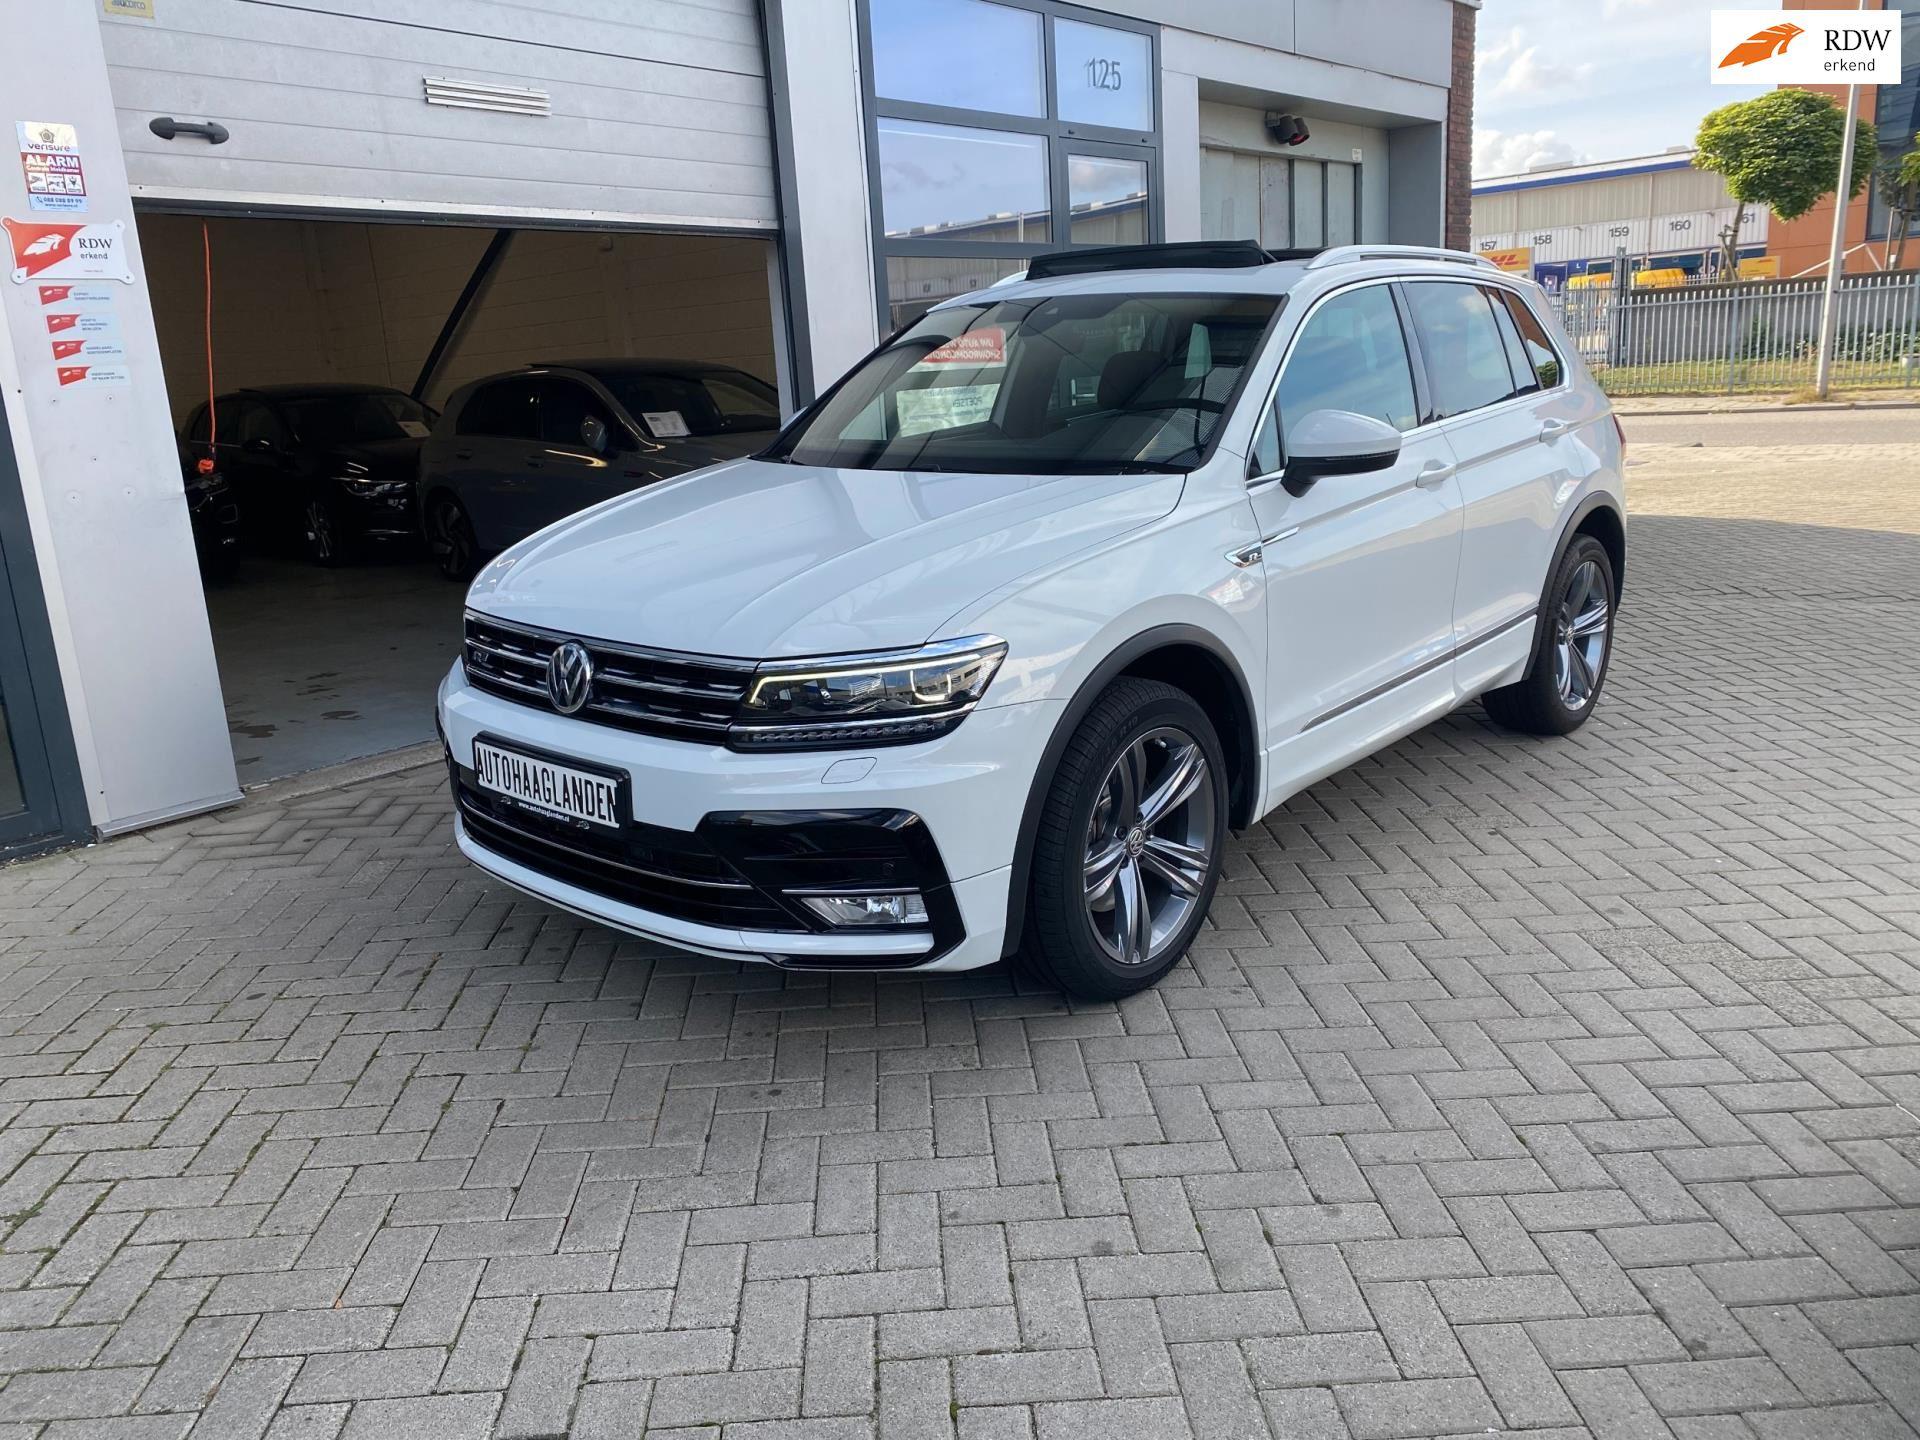 Volkswagen Tiguan occasion - Auto Haaglanden